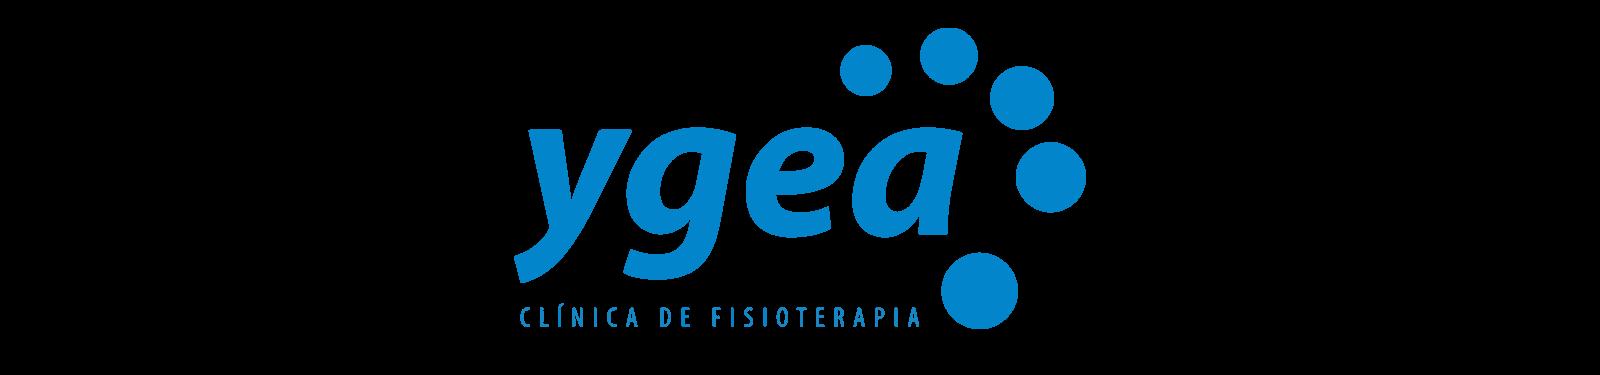 Ygea Fisioterapia